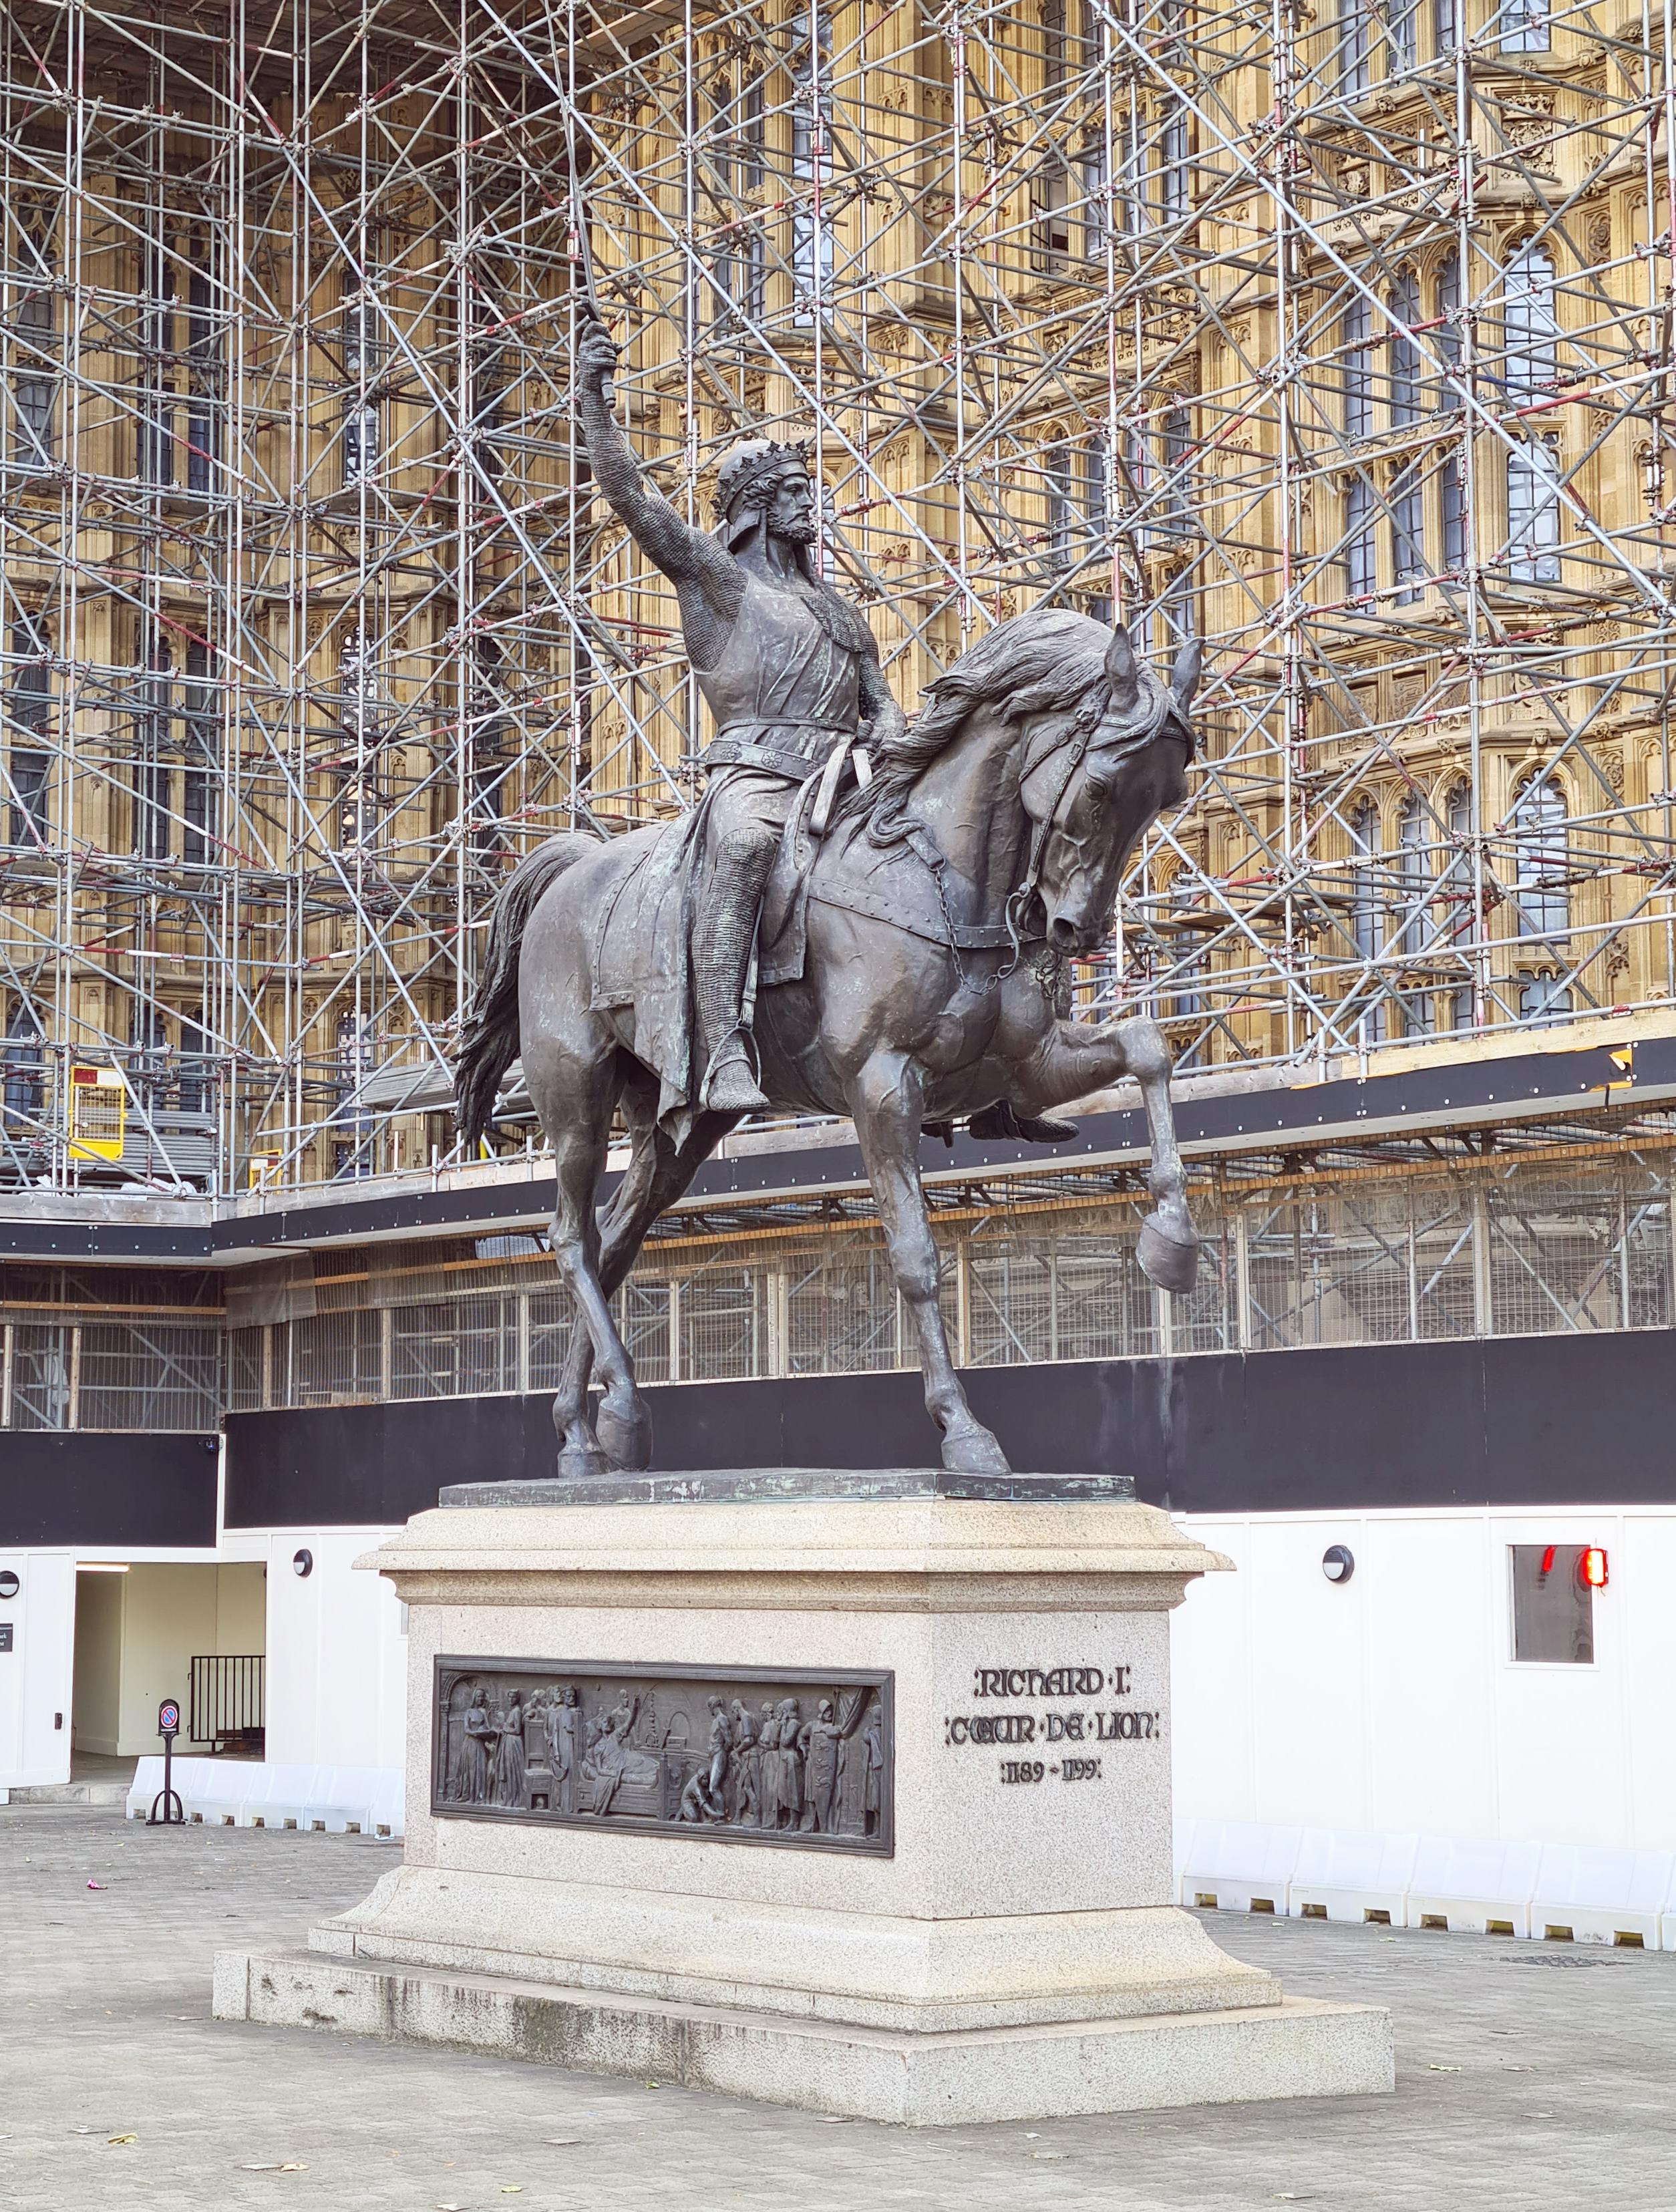 Richard Coeur de Lion (Richard the Lionheart). Baron Carlo Marochetti. Old Palace Yard, Palace of Westminster